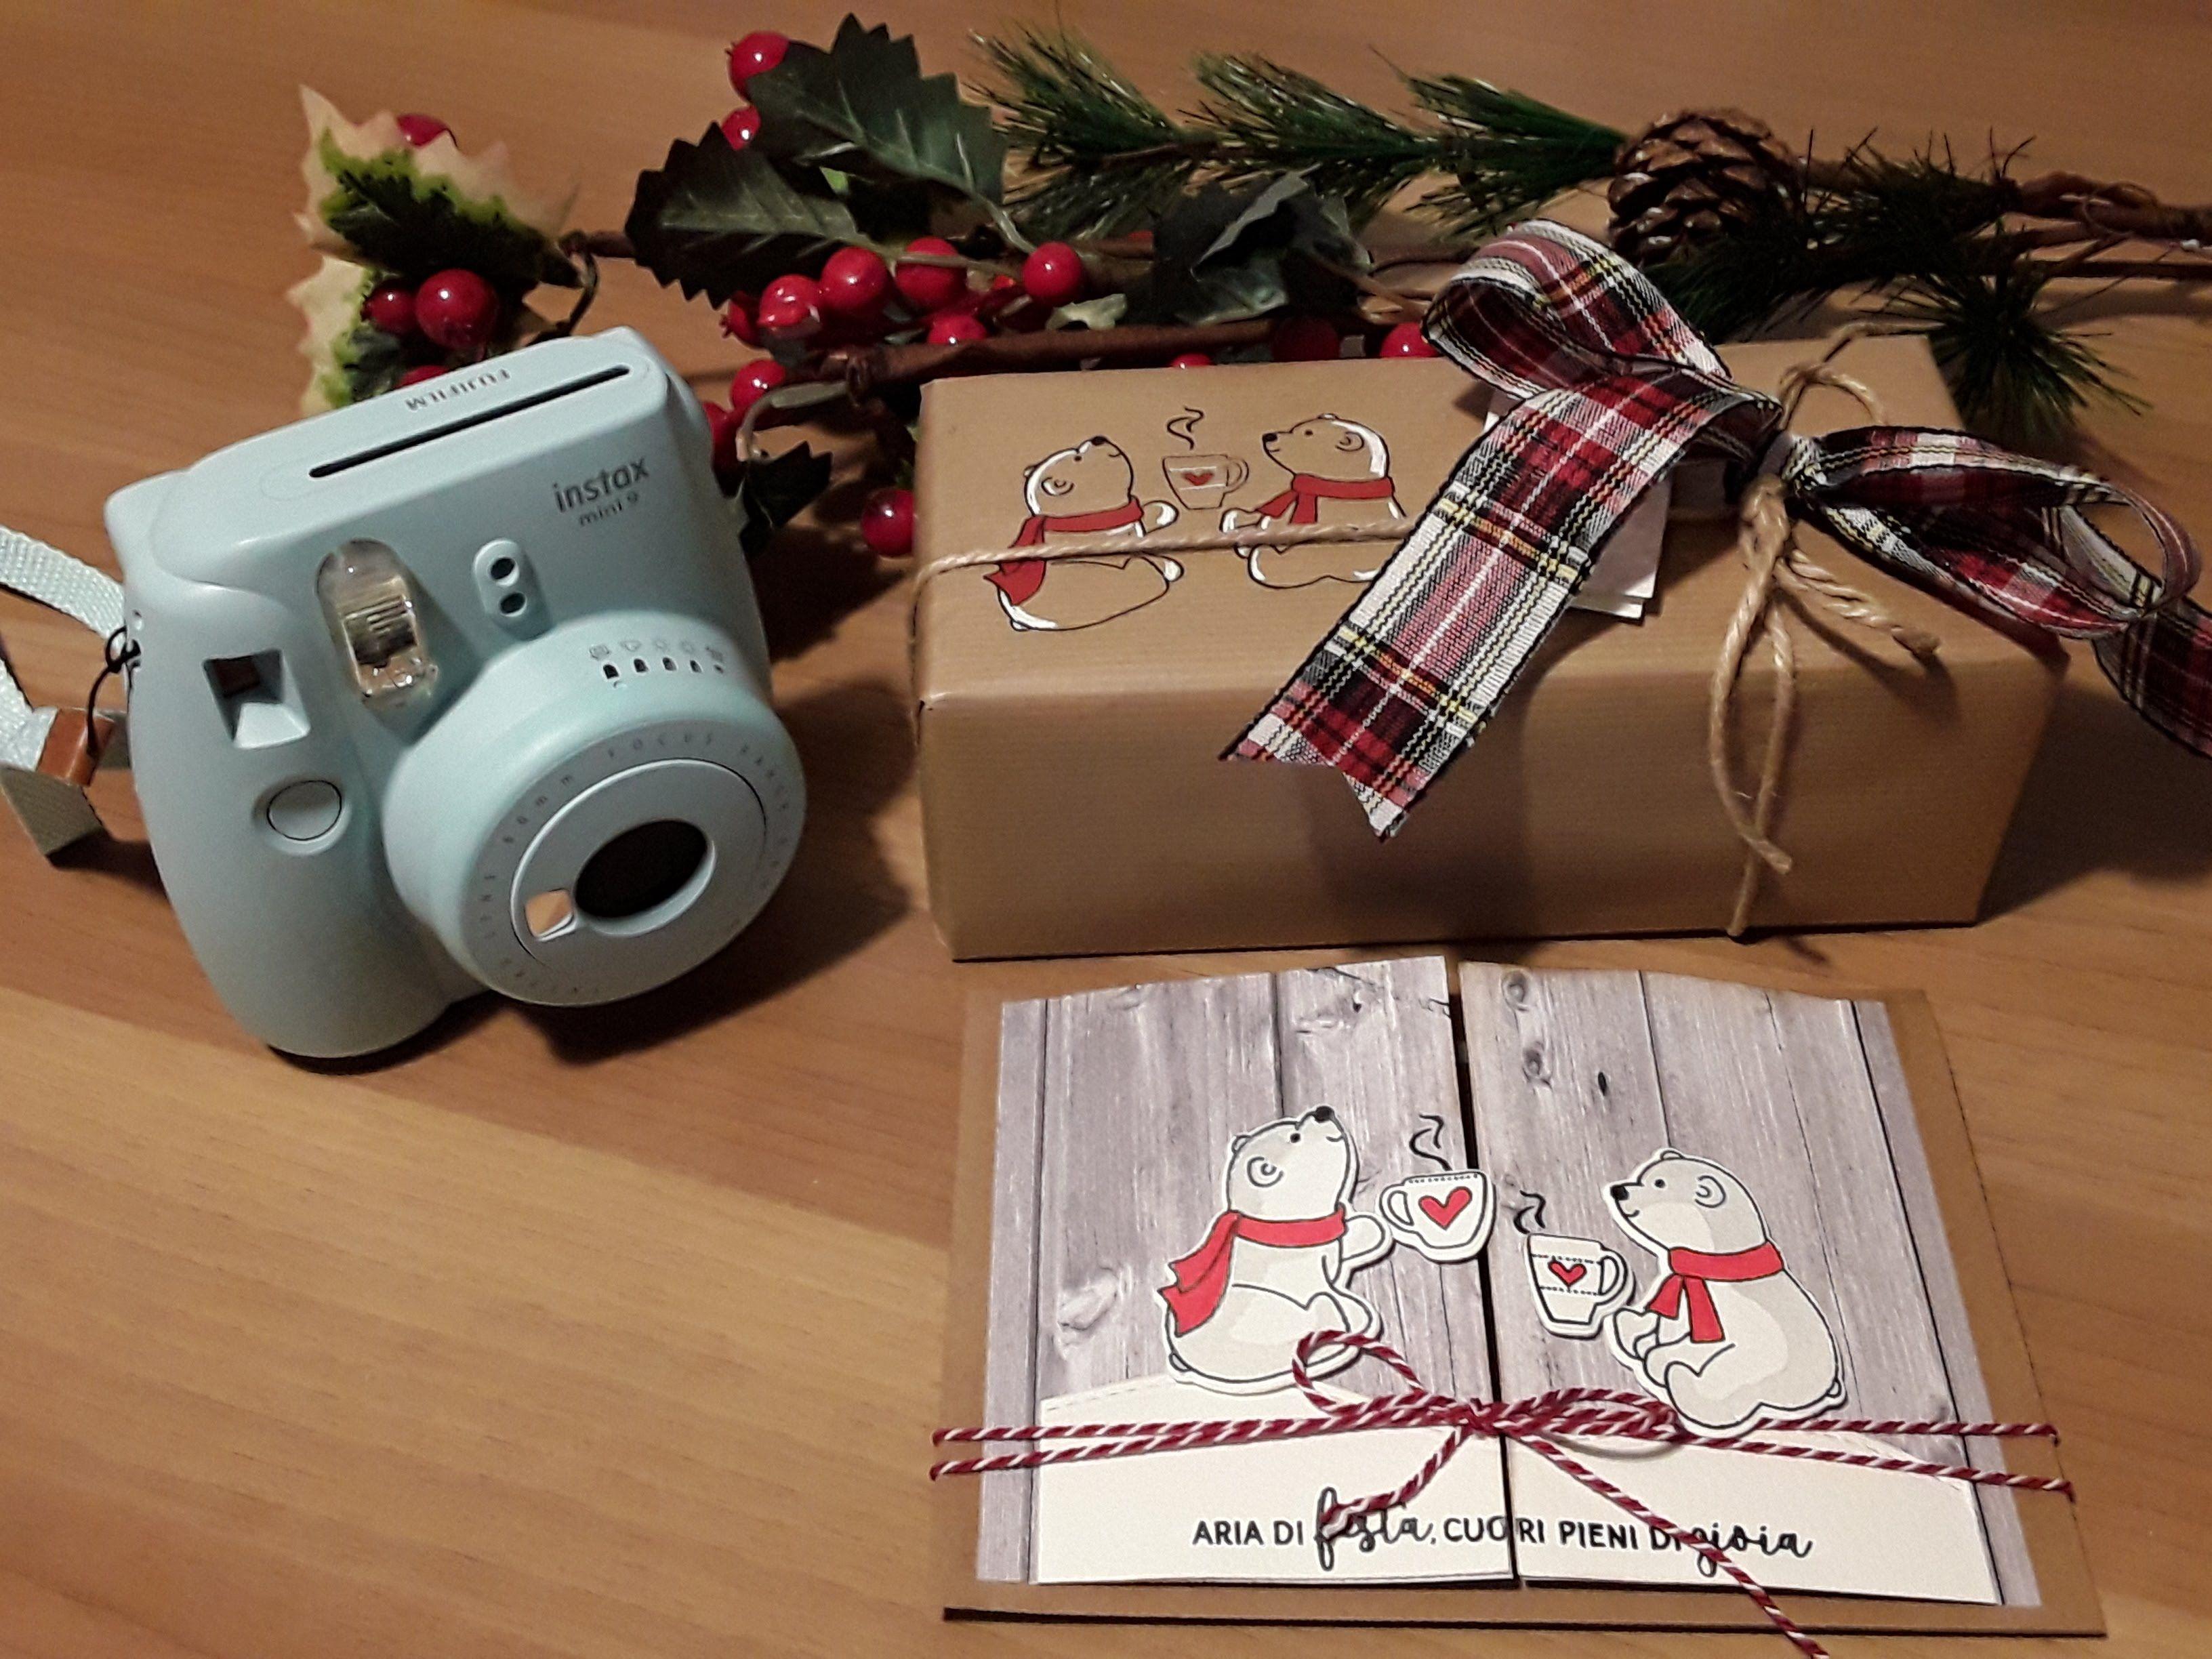 Instax Christmas Gift Instax4christmas Diy Diyhomedecor  # Meuble Tv Zodio